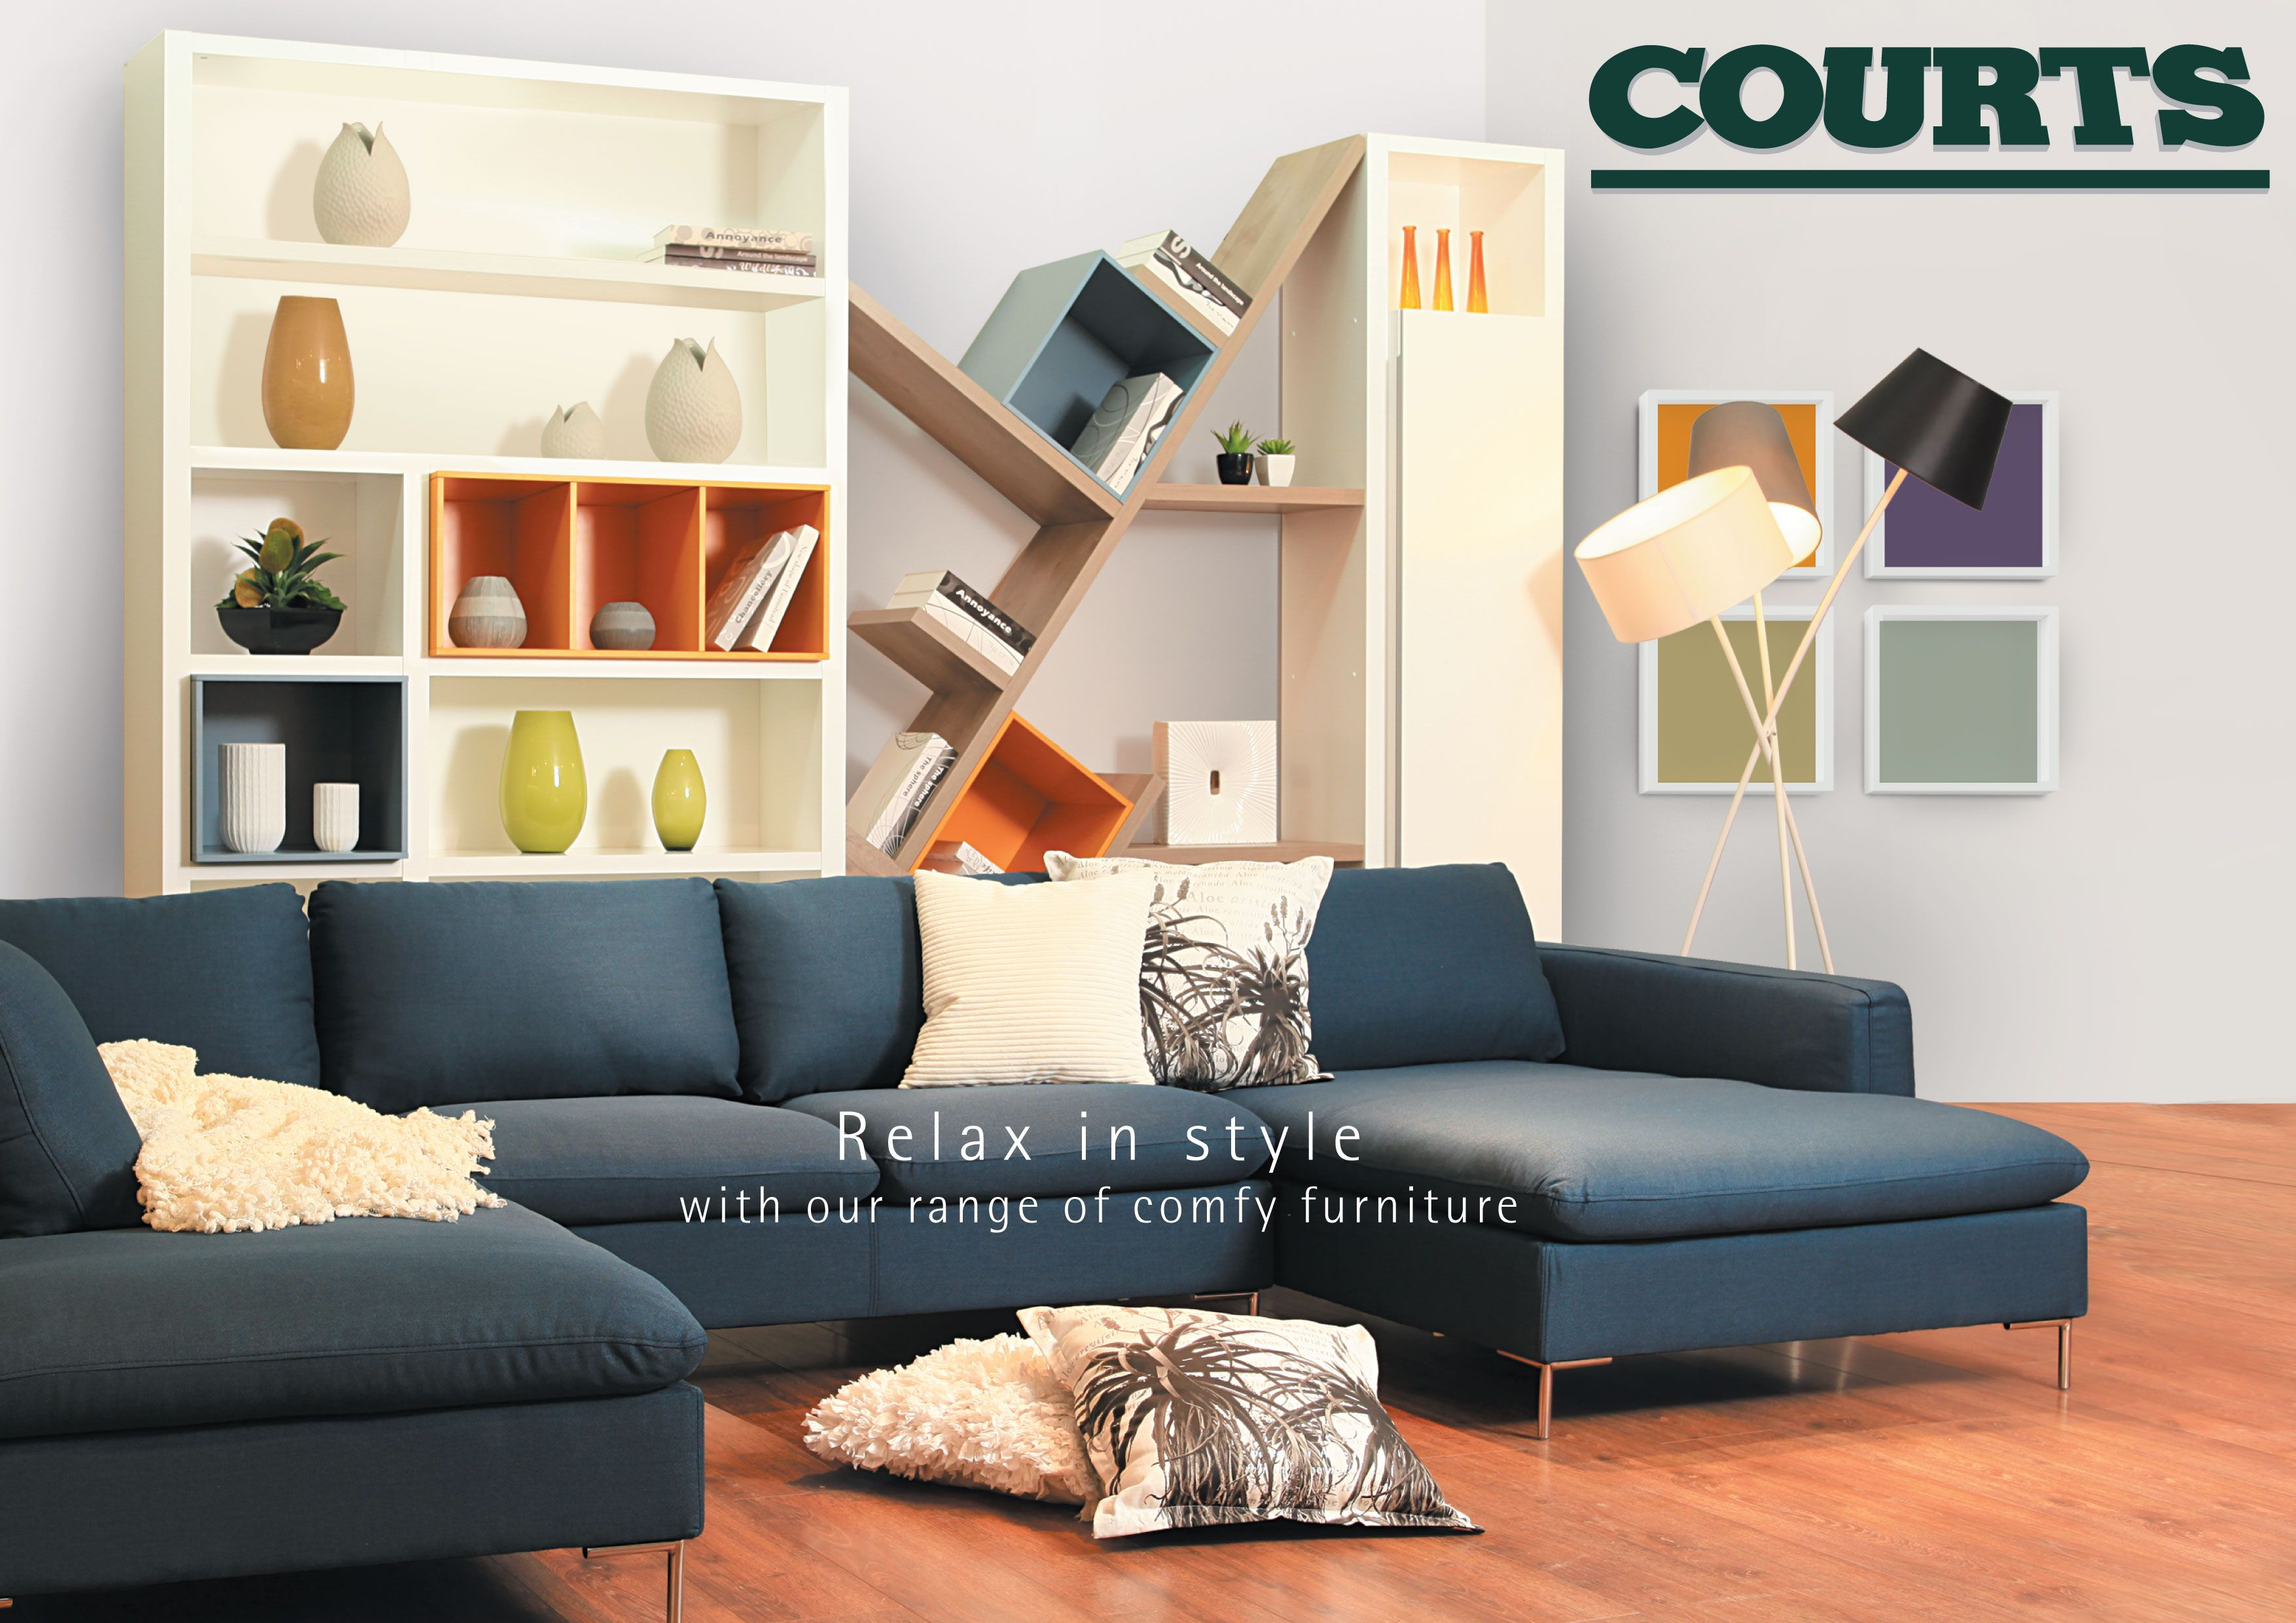 sofa at courts twin sleeper sheet set mauritius furniture catalogue 2015 catalog